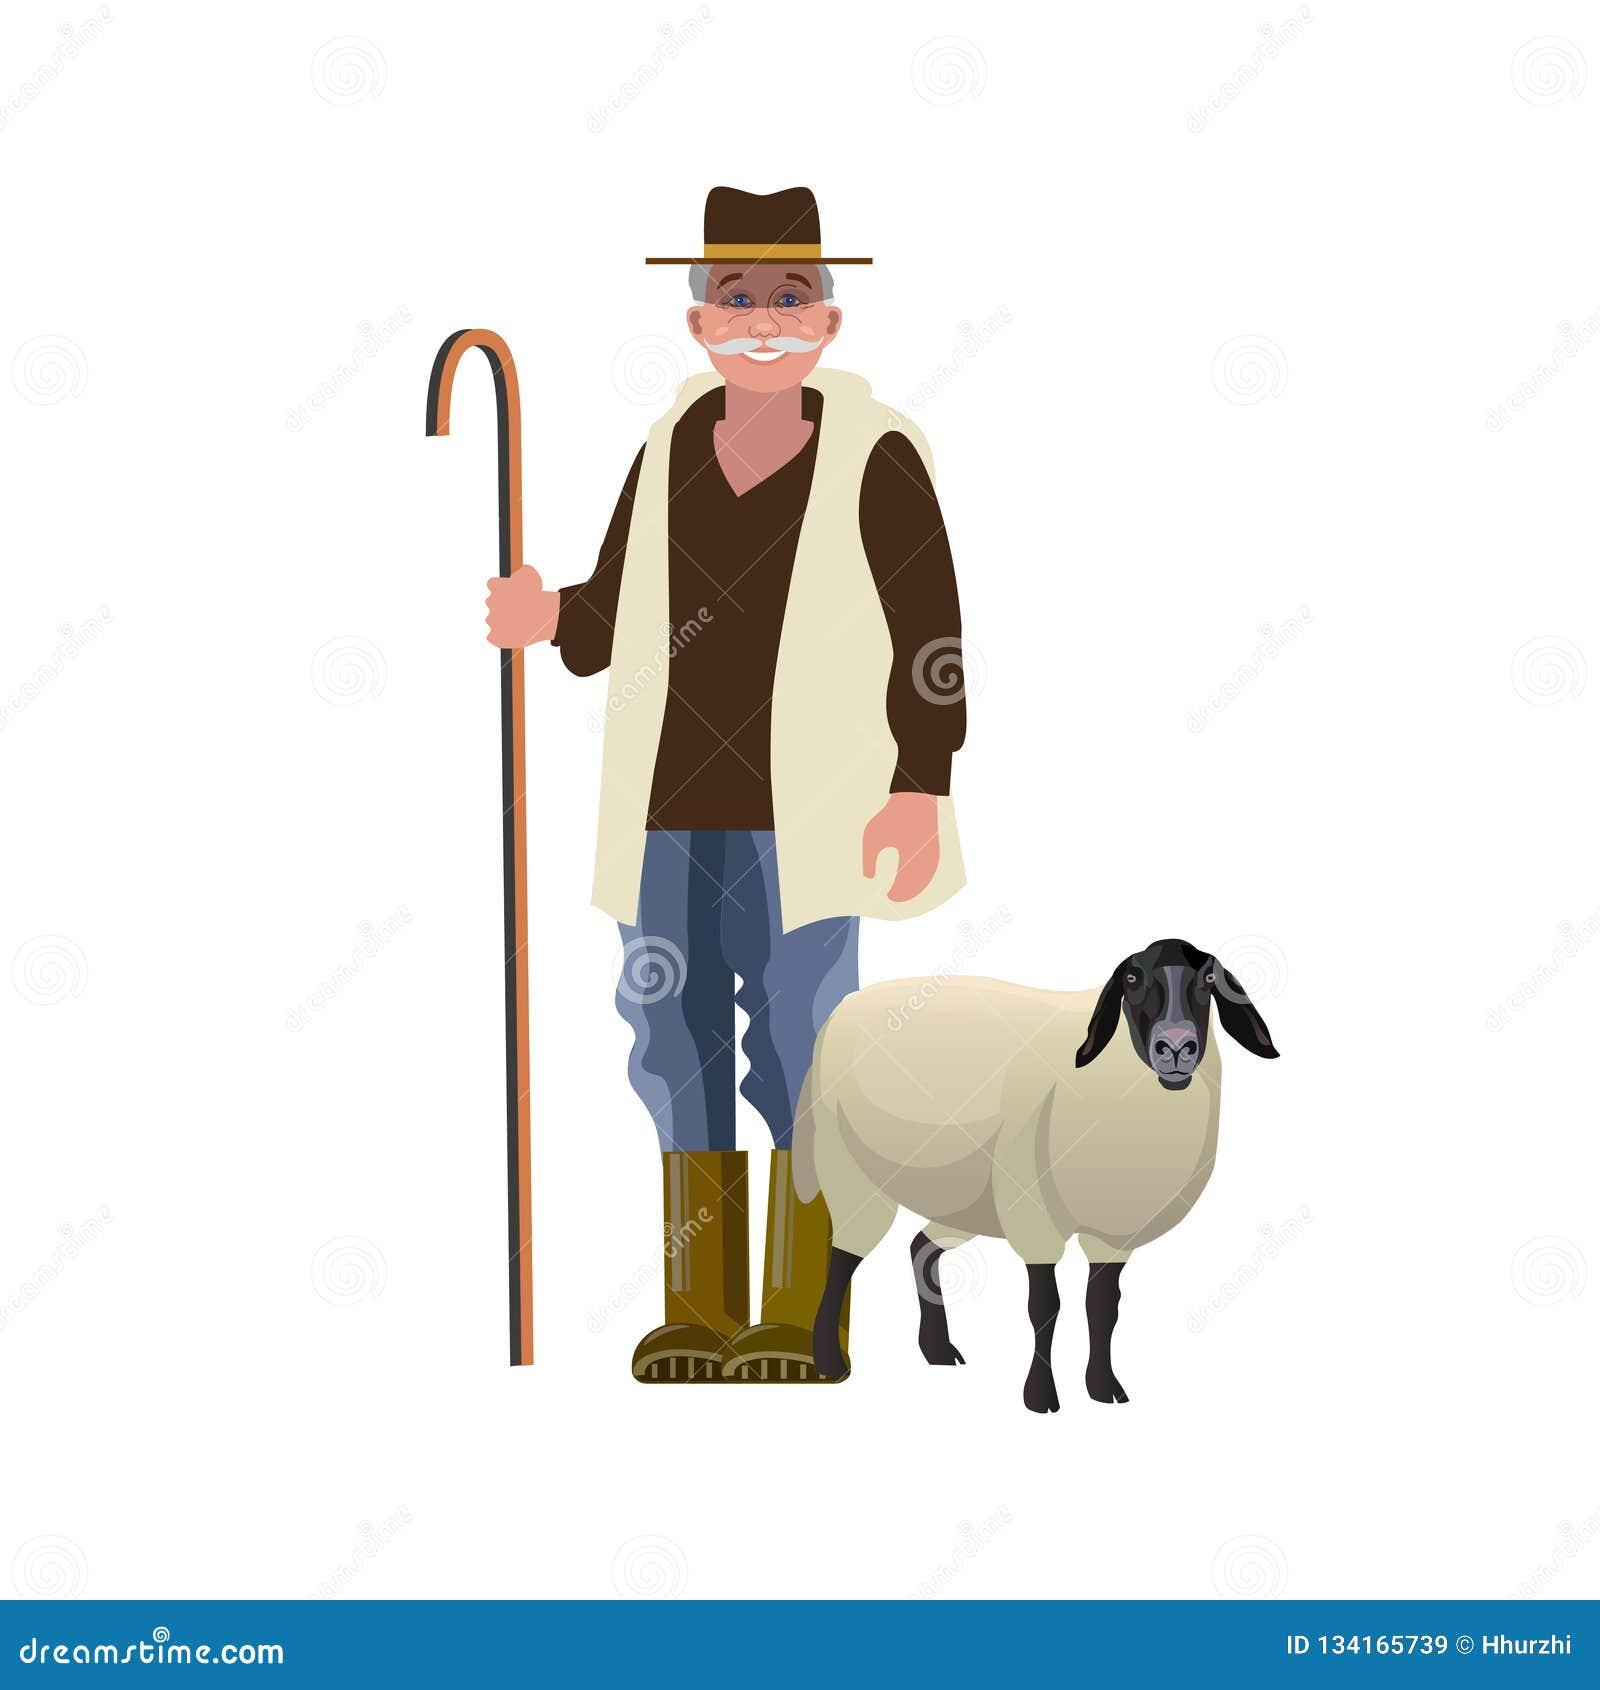 Shepherd with a sheep